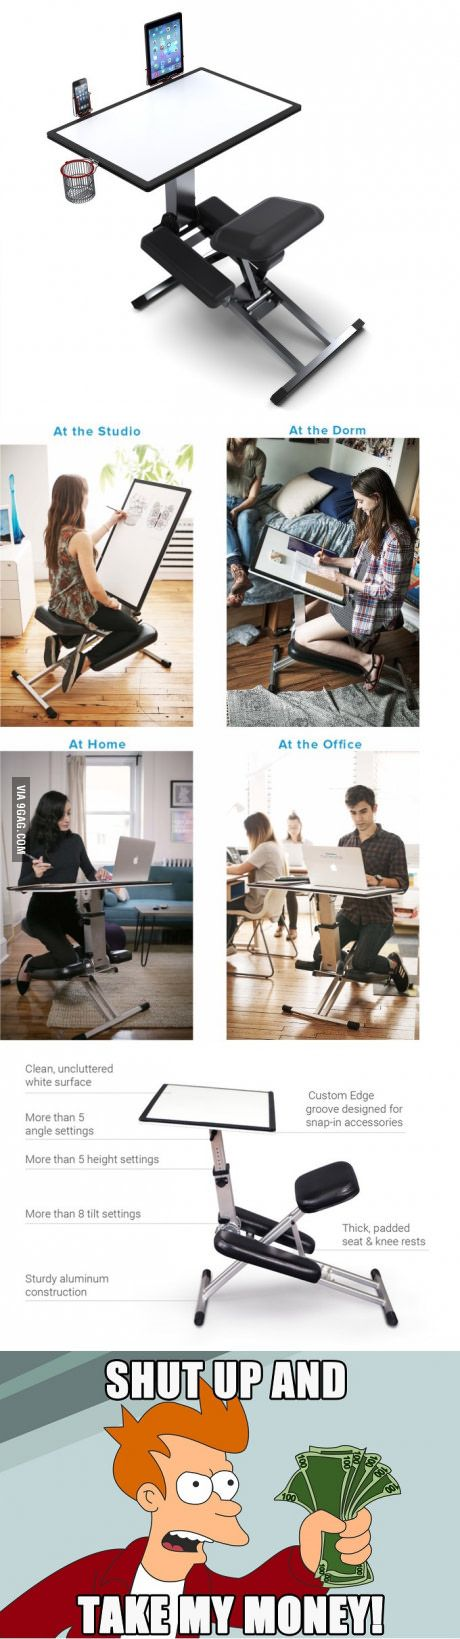 New portable desk design, just wow!